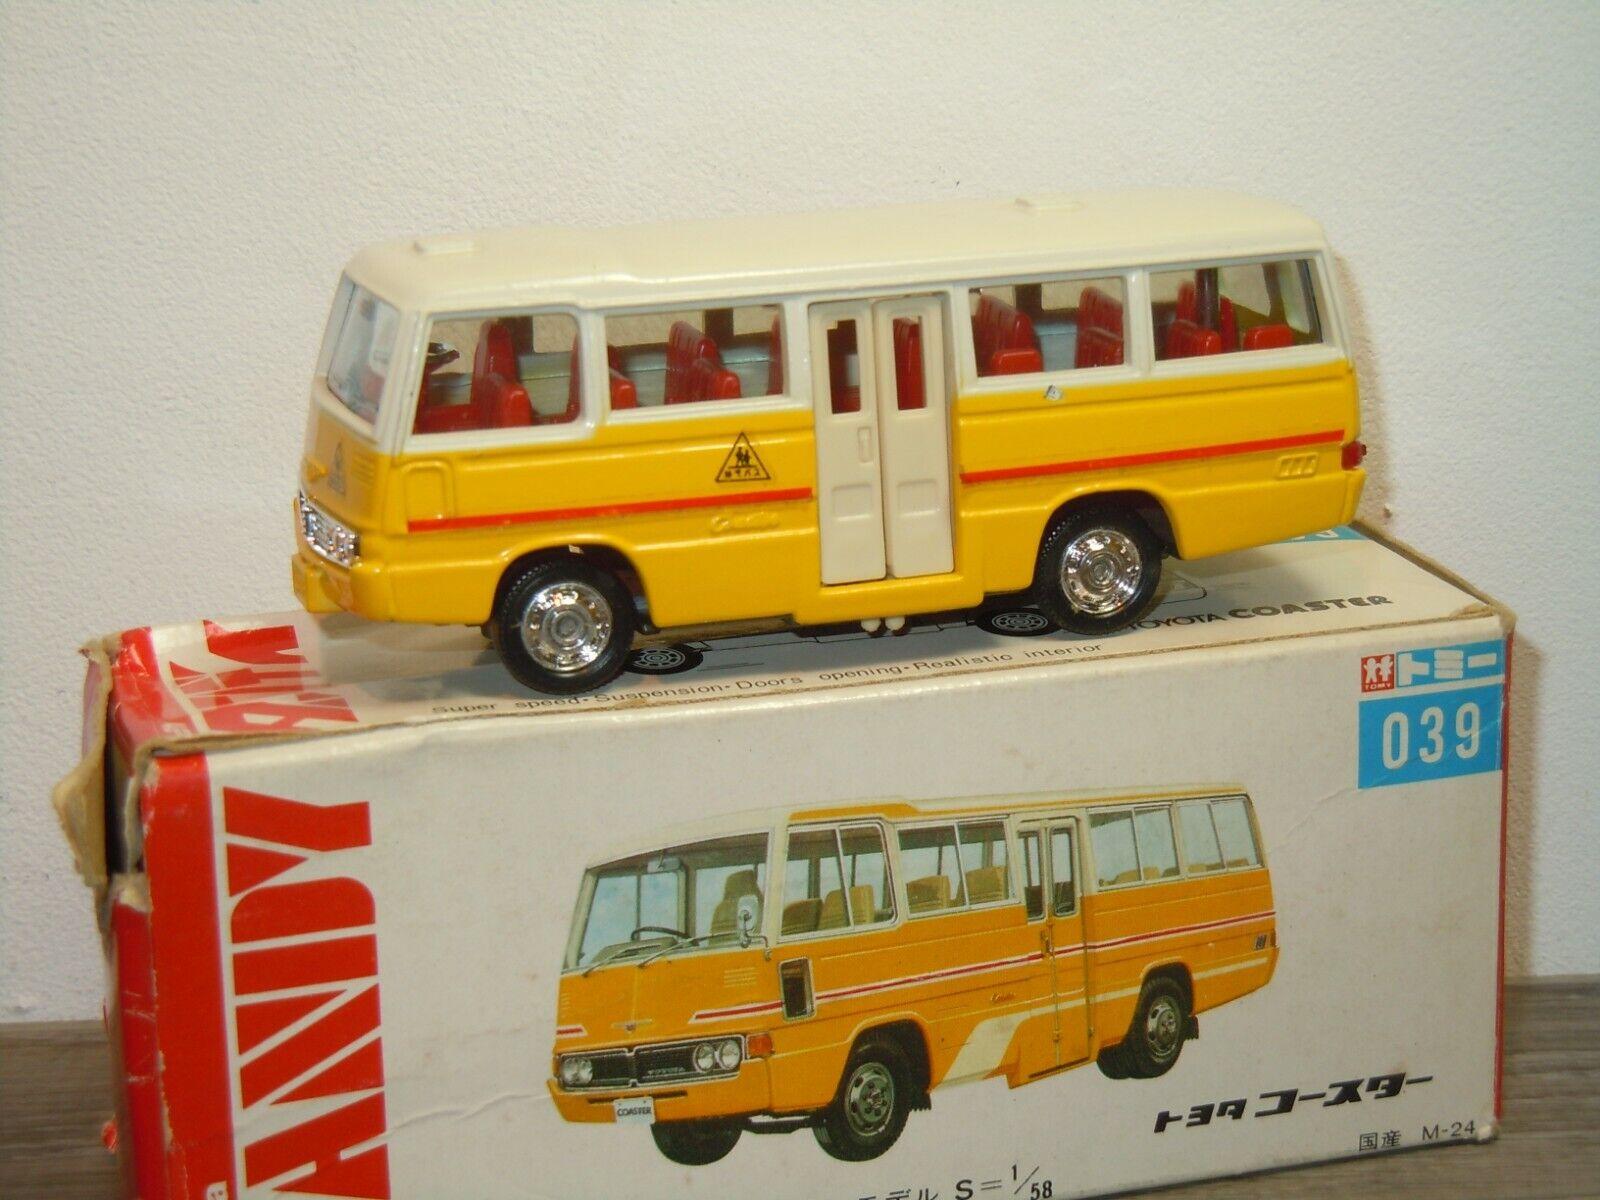 Toyota Coaster - Tomica Dandy 039 Japan 1 58 in Box 36677